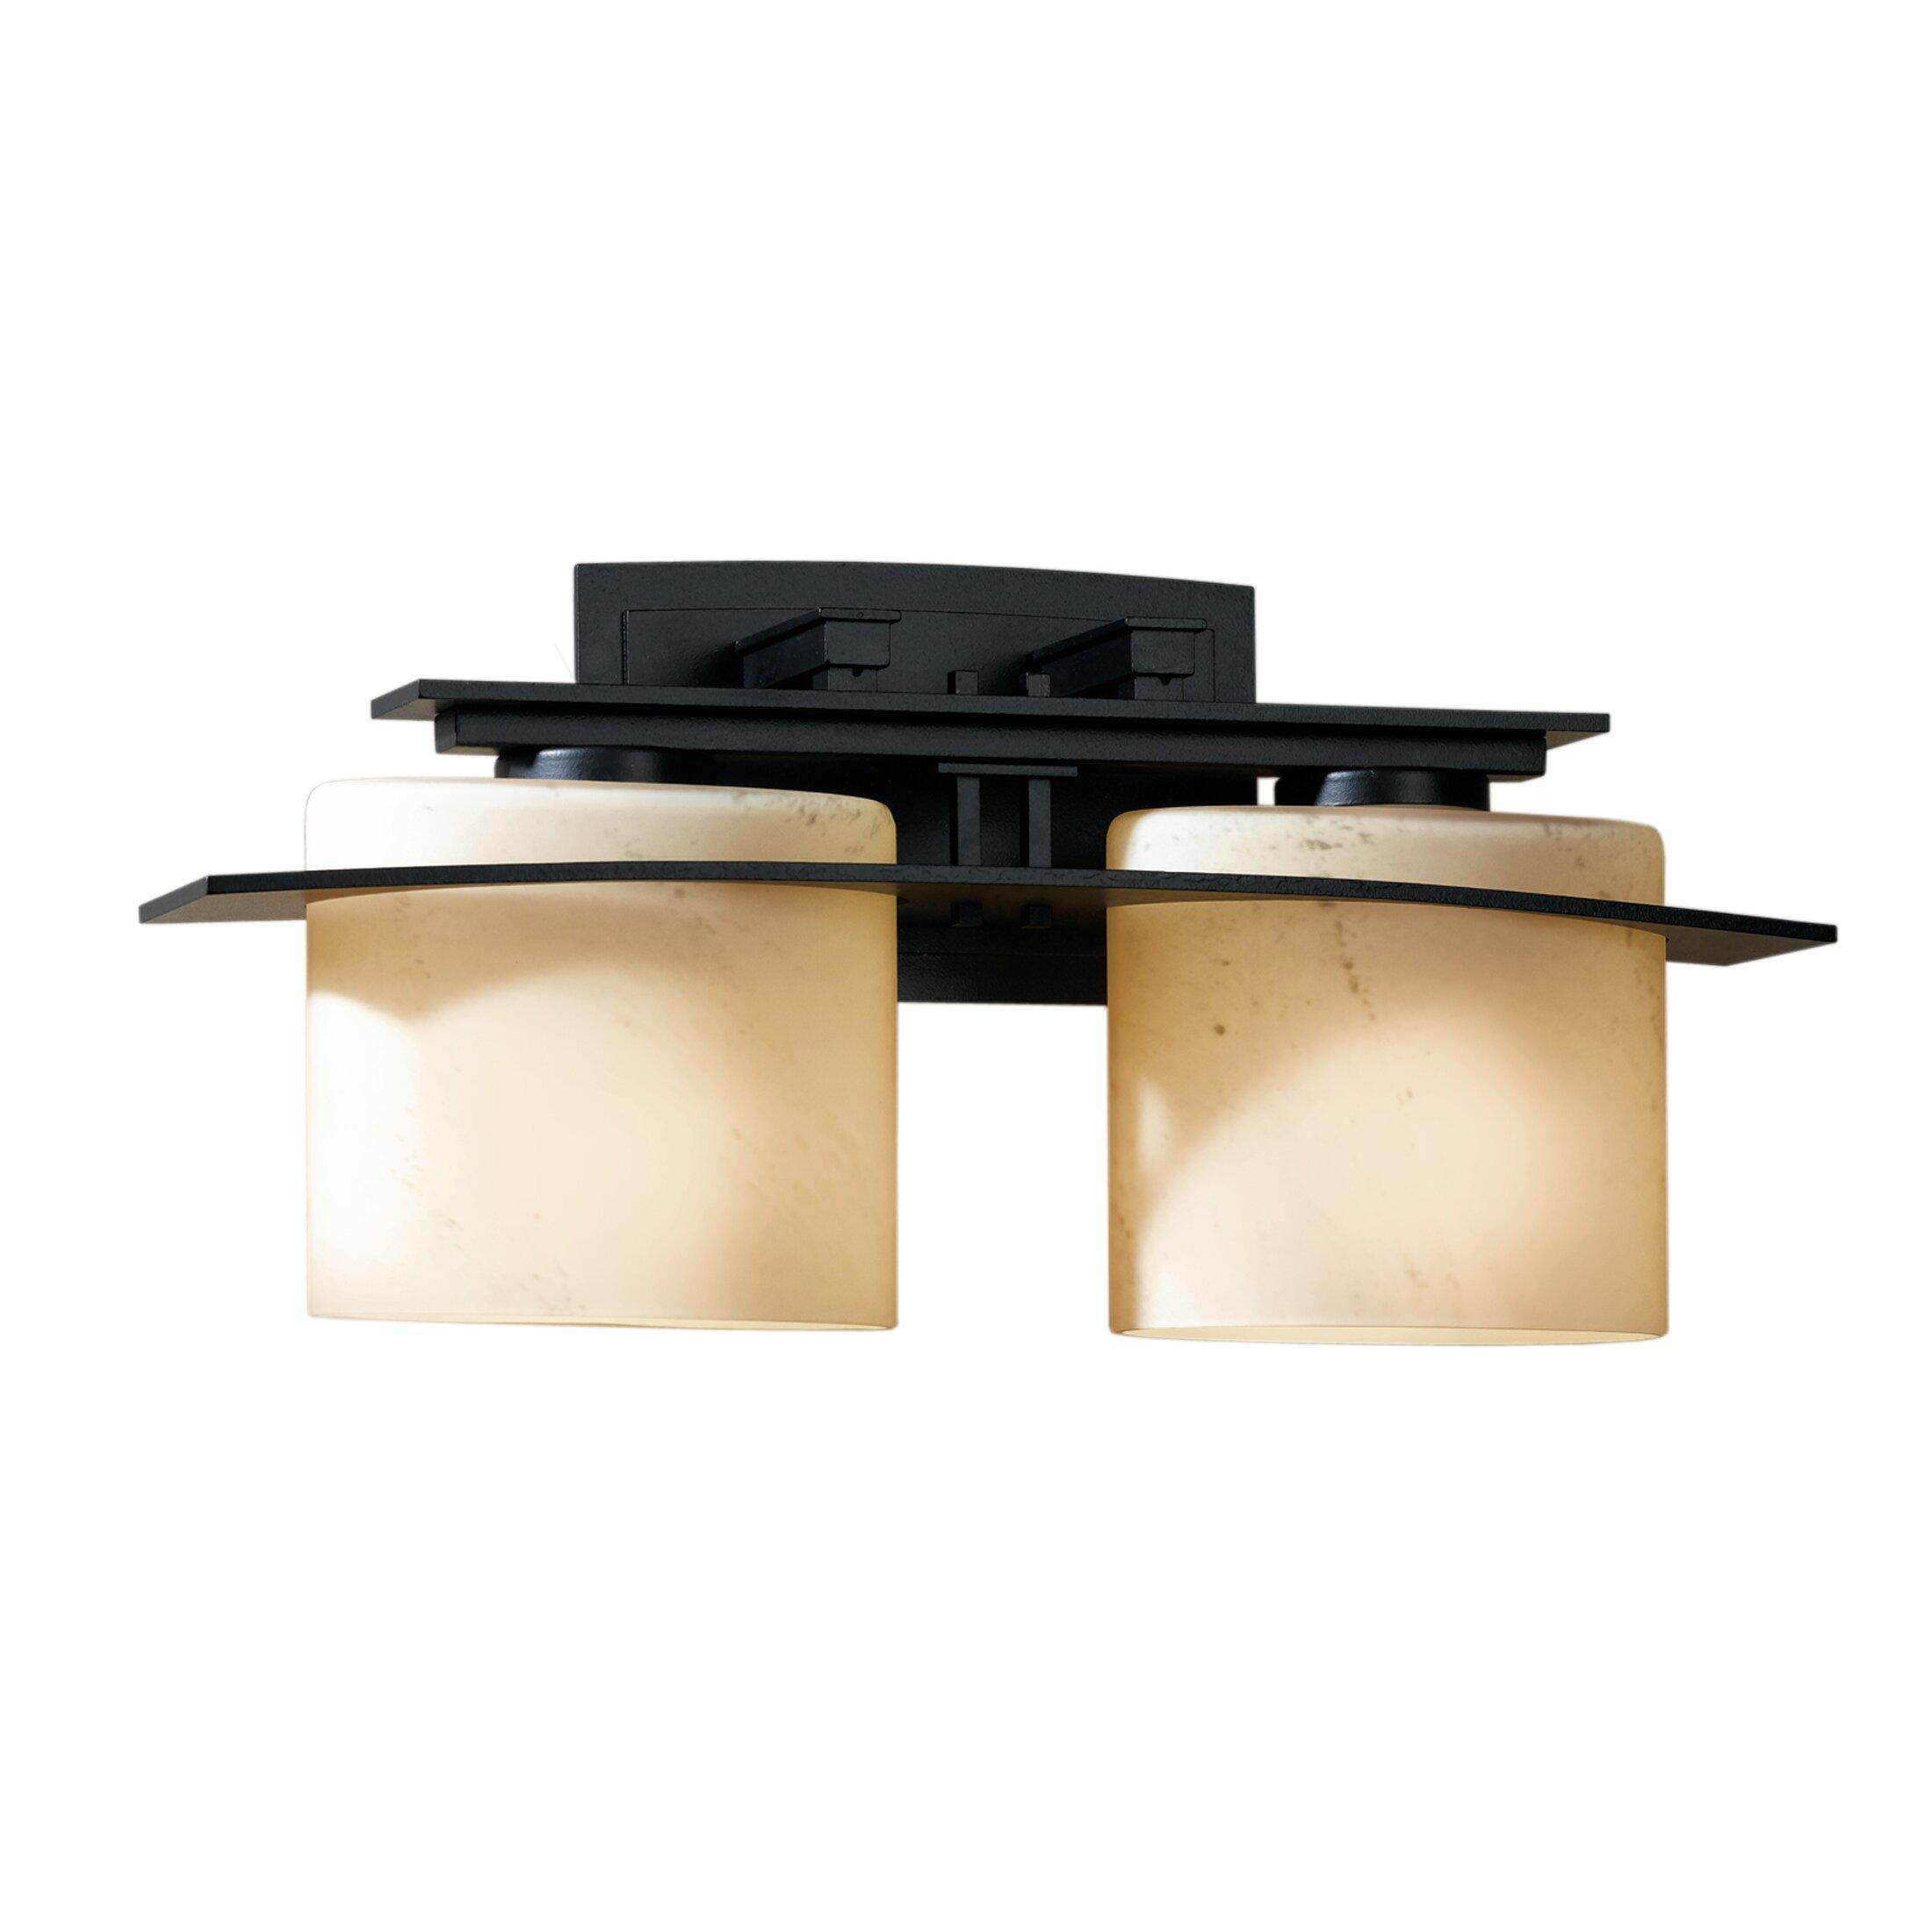 Hubbardton forge ellipse 2 light wall sconce wayfair for Hubbardton forge bathroom lighting